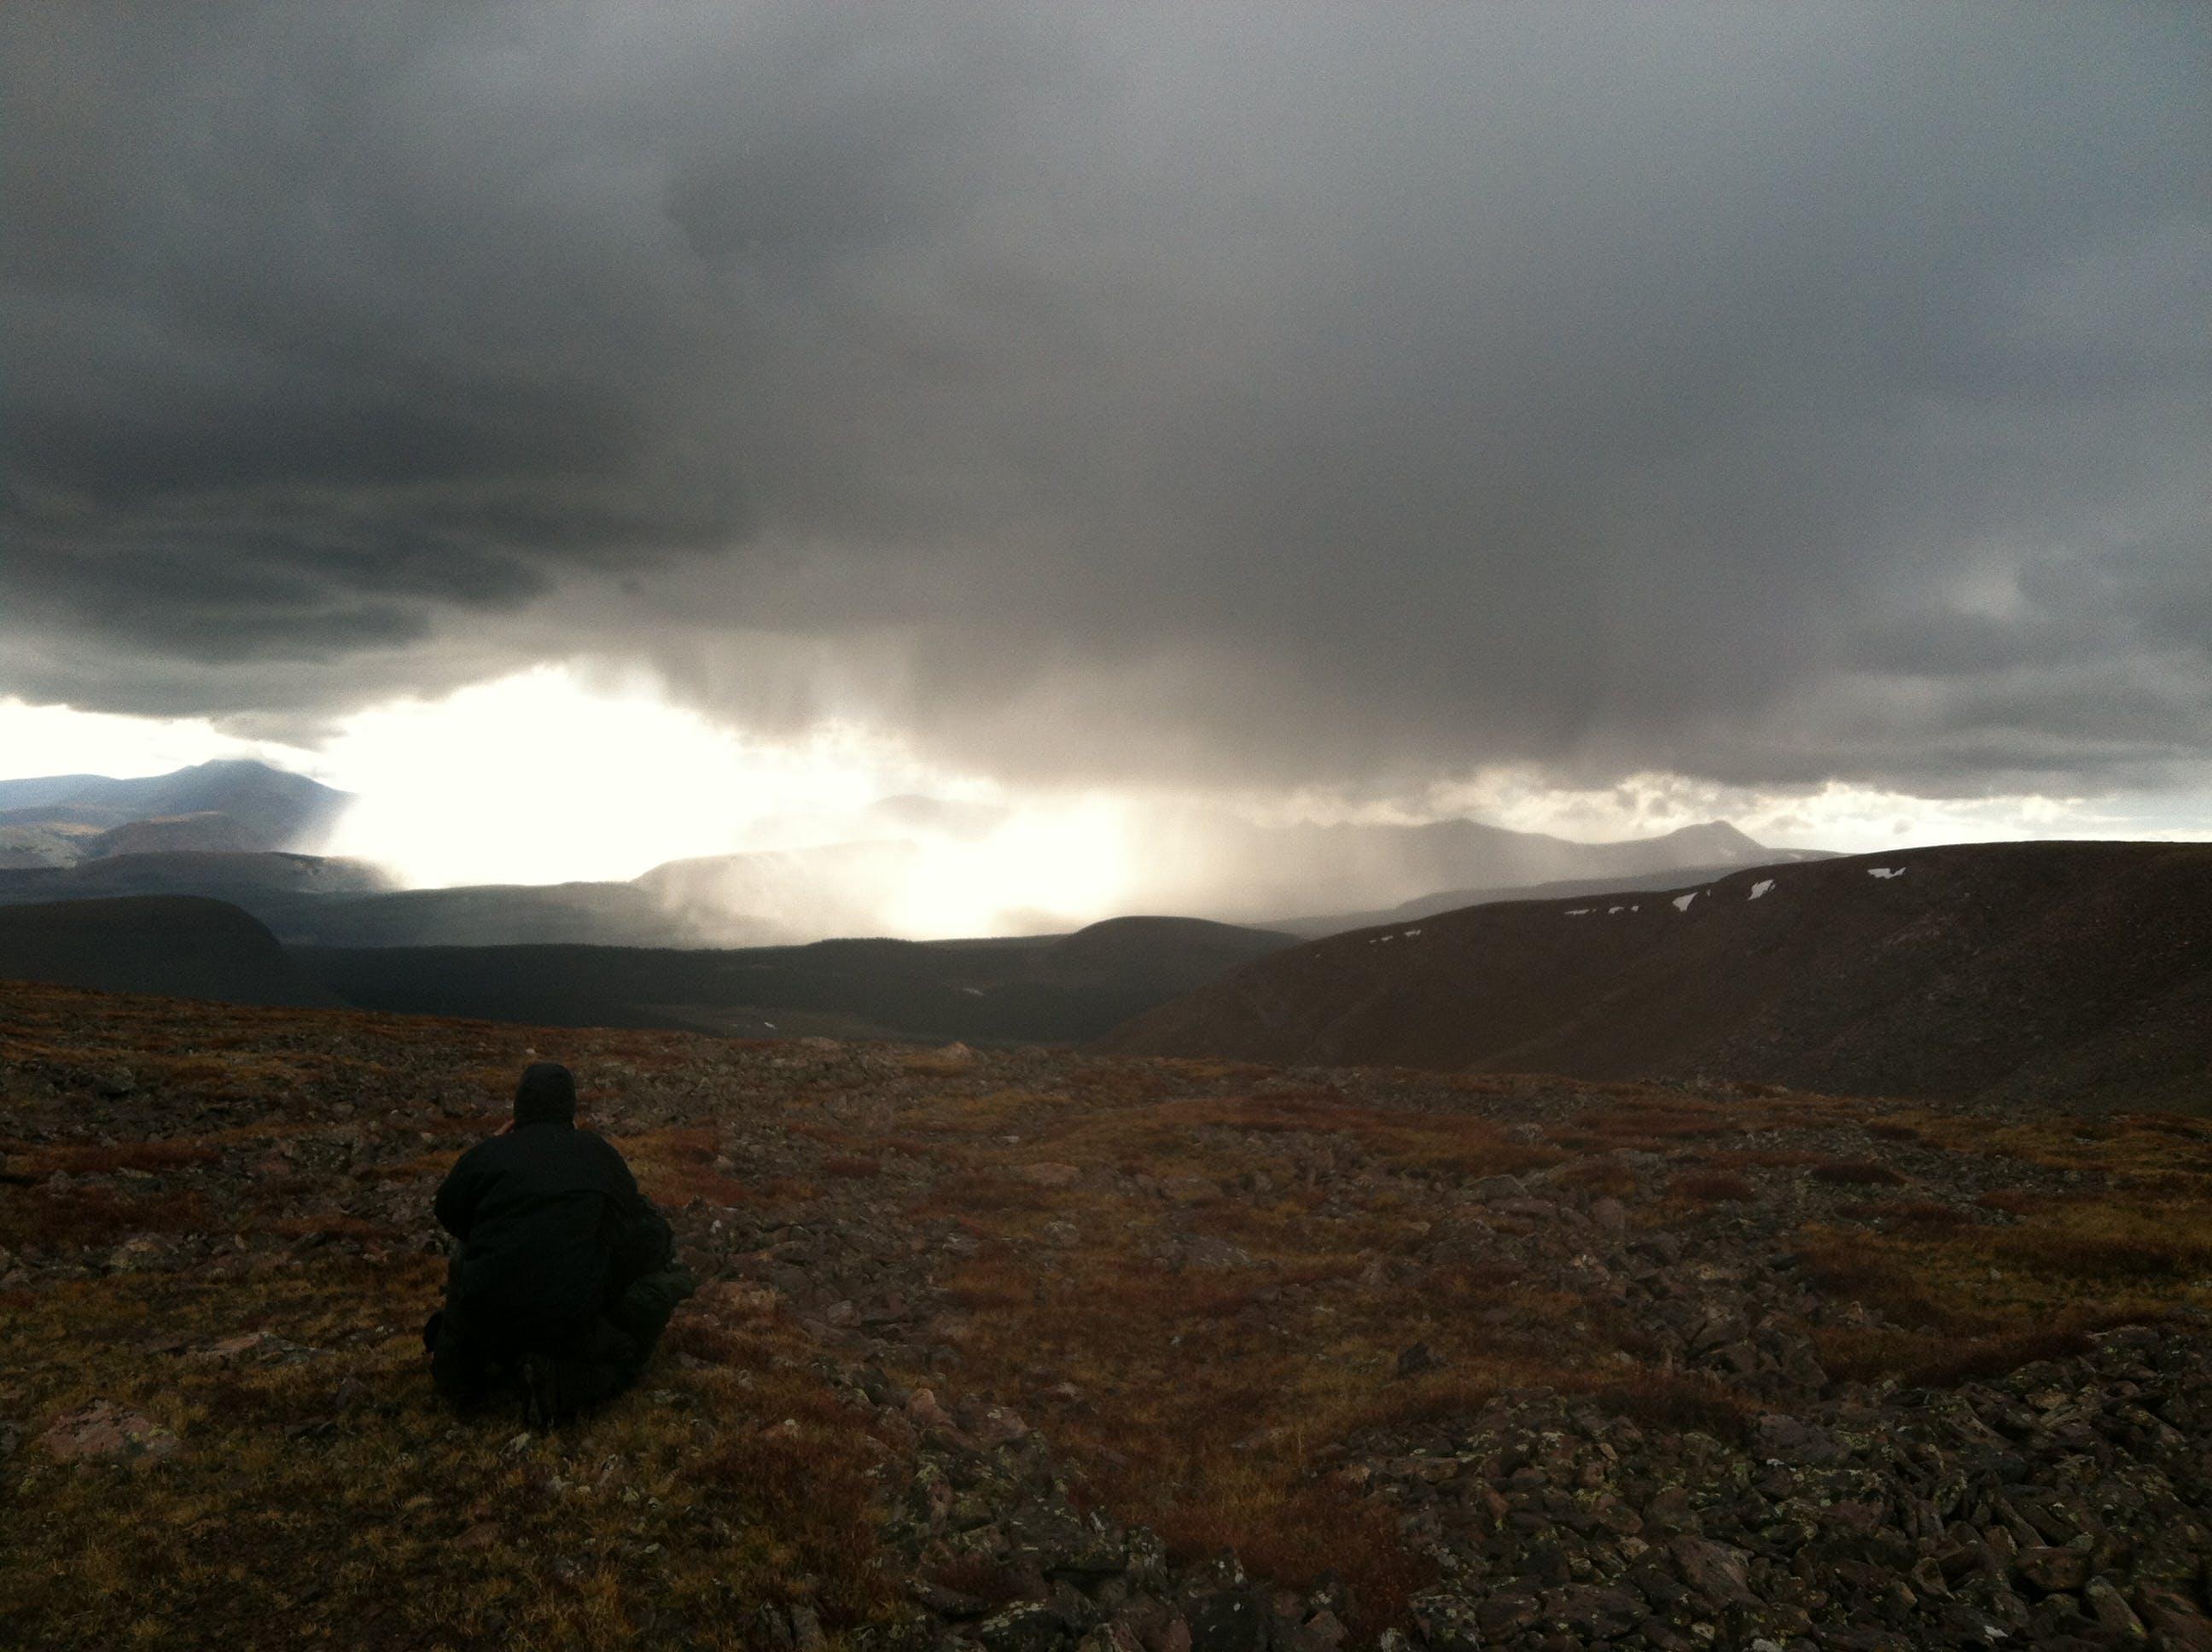 Free stock photo of backpacking, Joe Leineweber, thunderstorm, uinta mountains